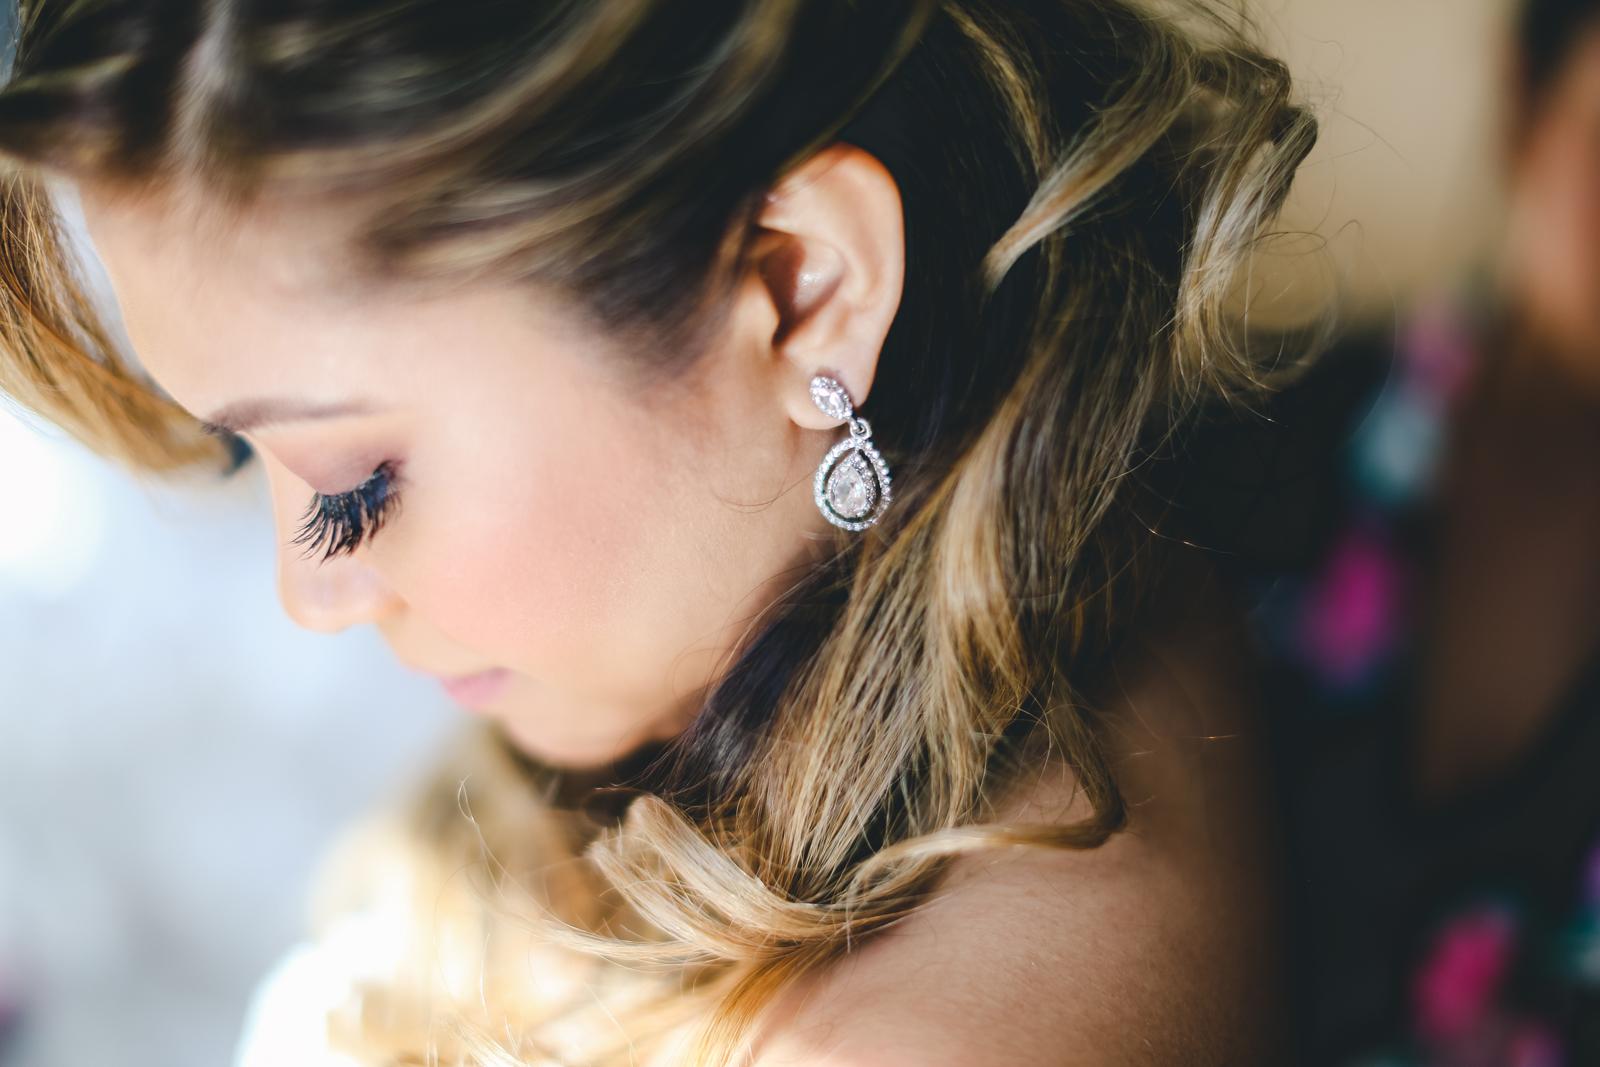 roma-and-dale-wedding-day-sneak-peak-7.jpg